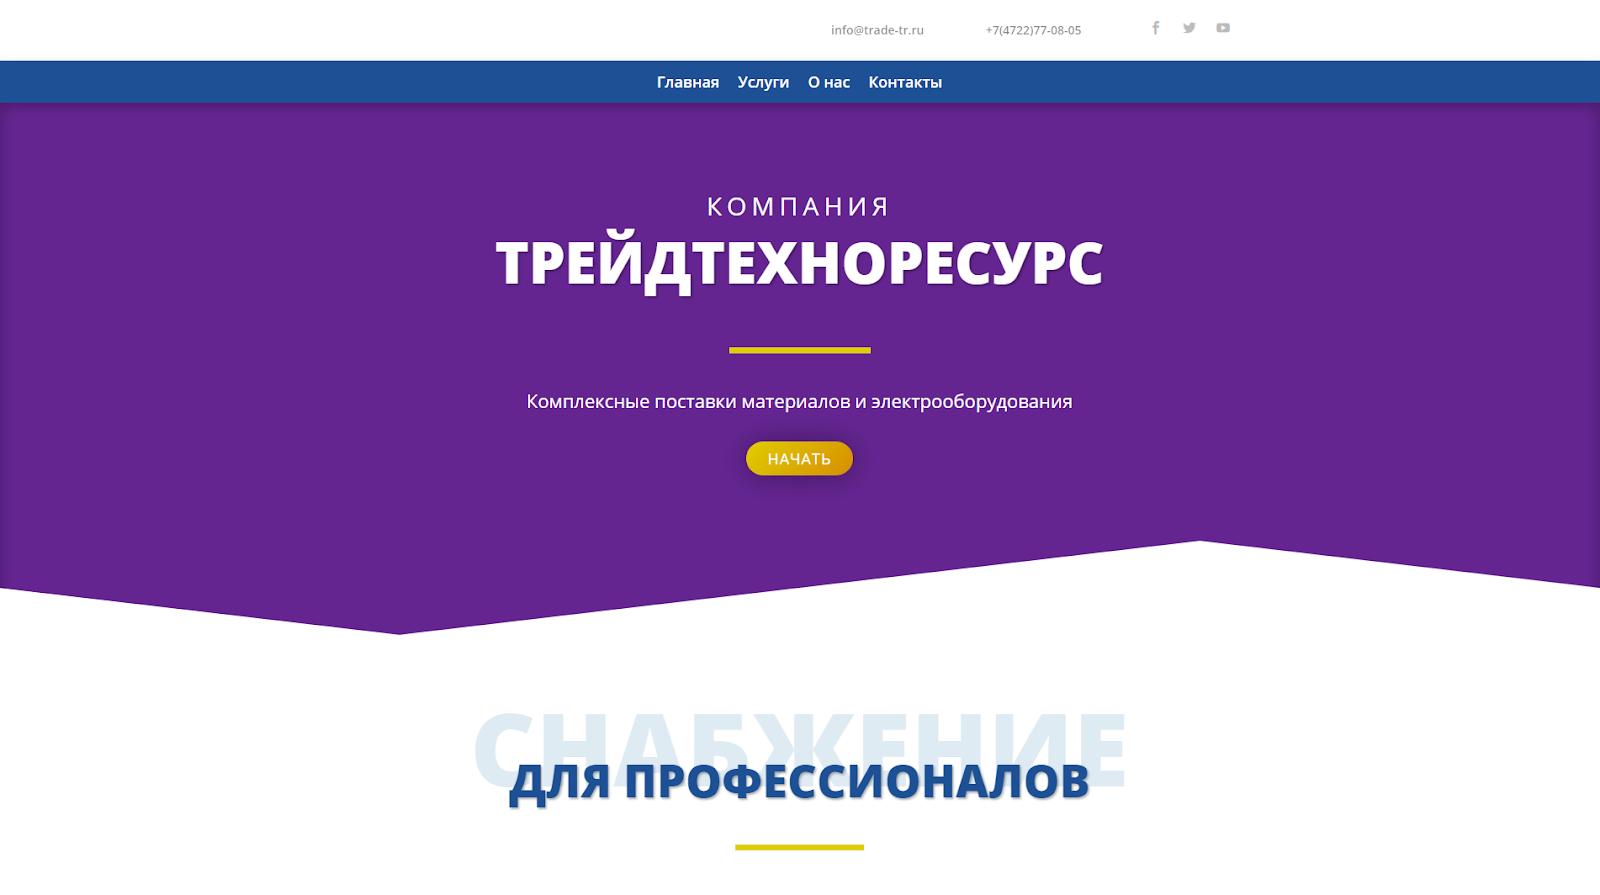 пример сайта